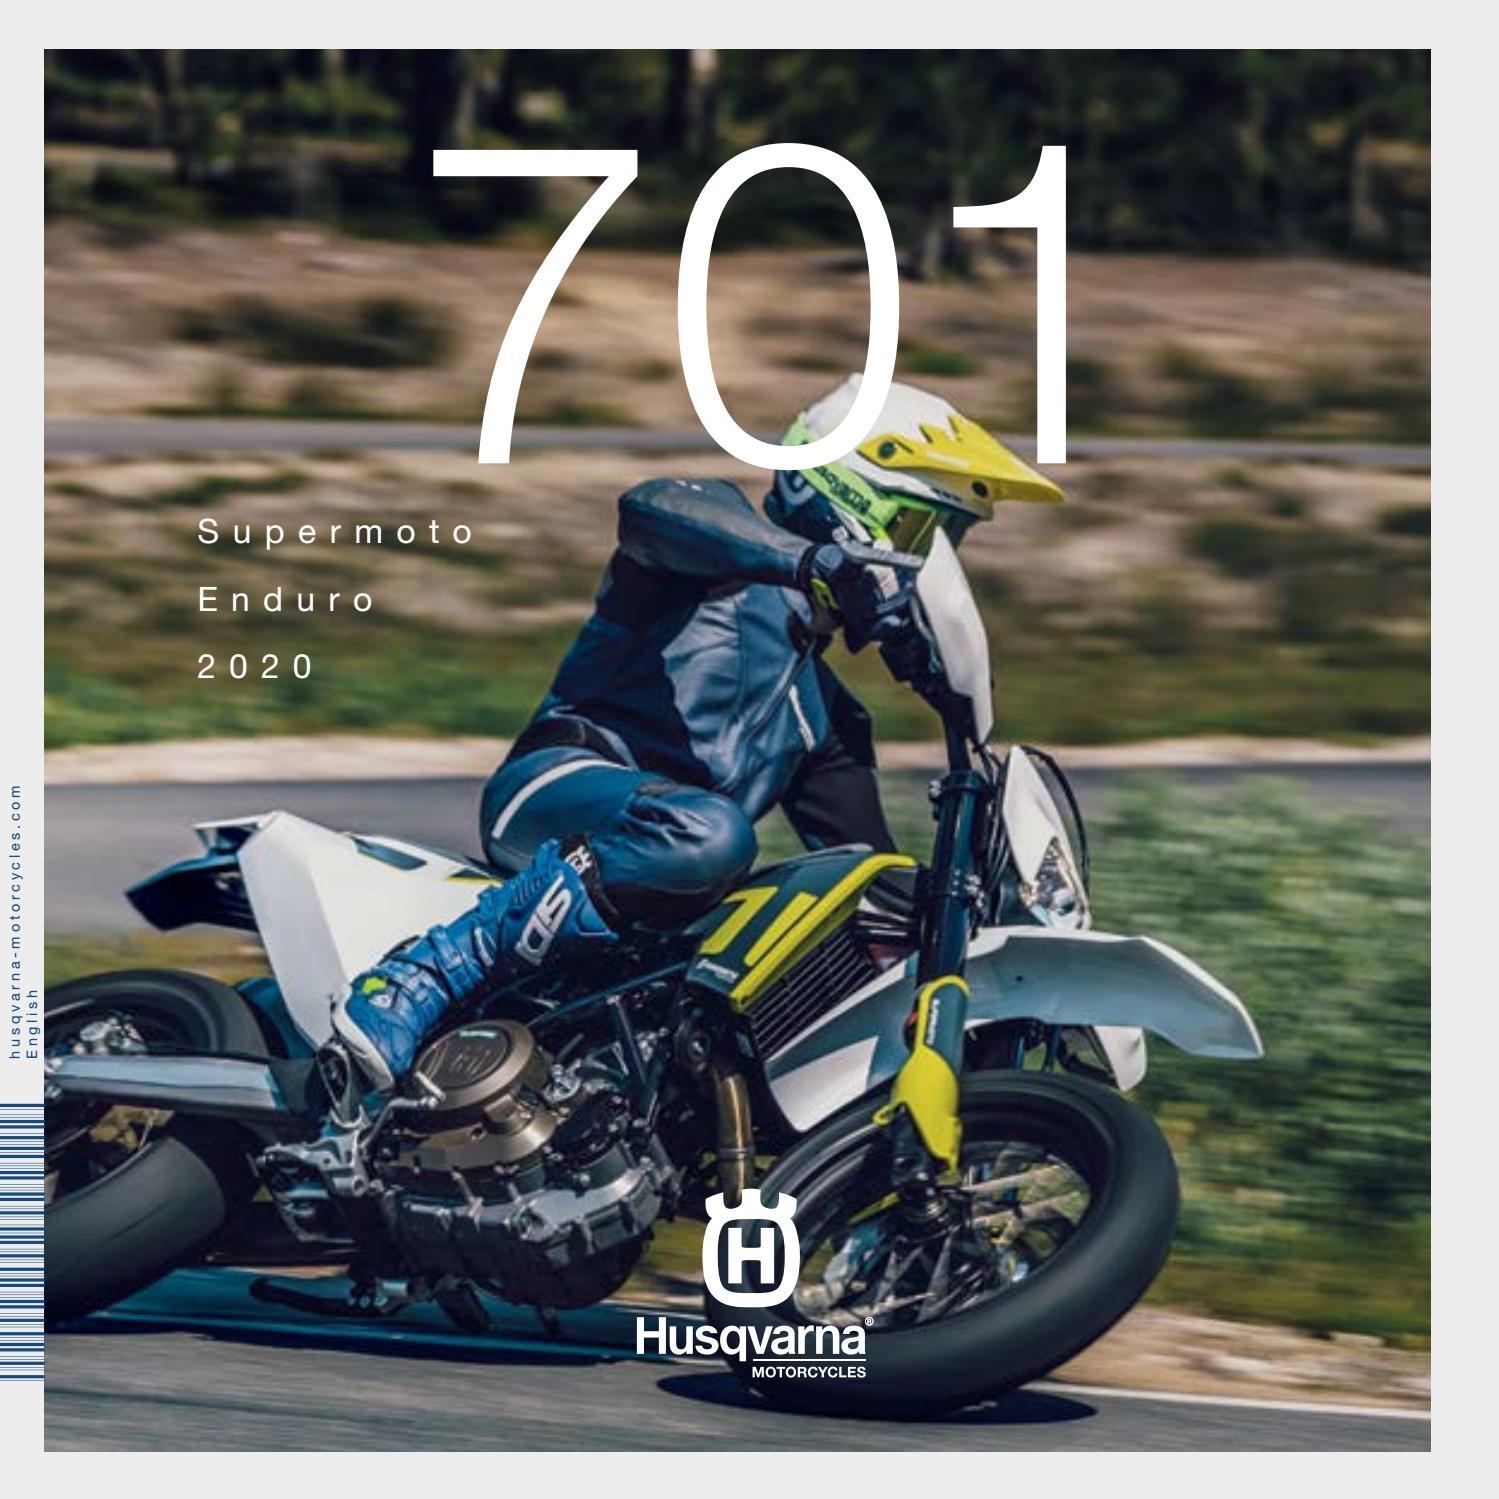 2020 Husqvarna Motorcycles 701 Supermoto Enduro Model Range Brochure Us Can By Ktm Group Issuu